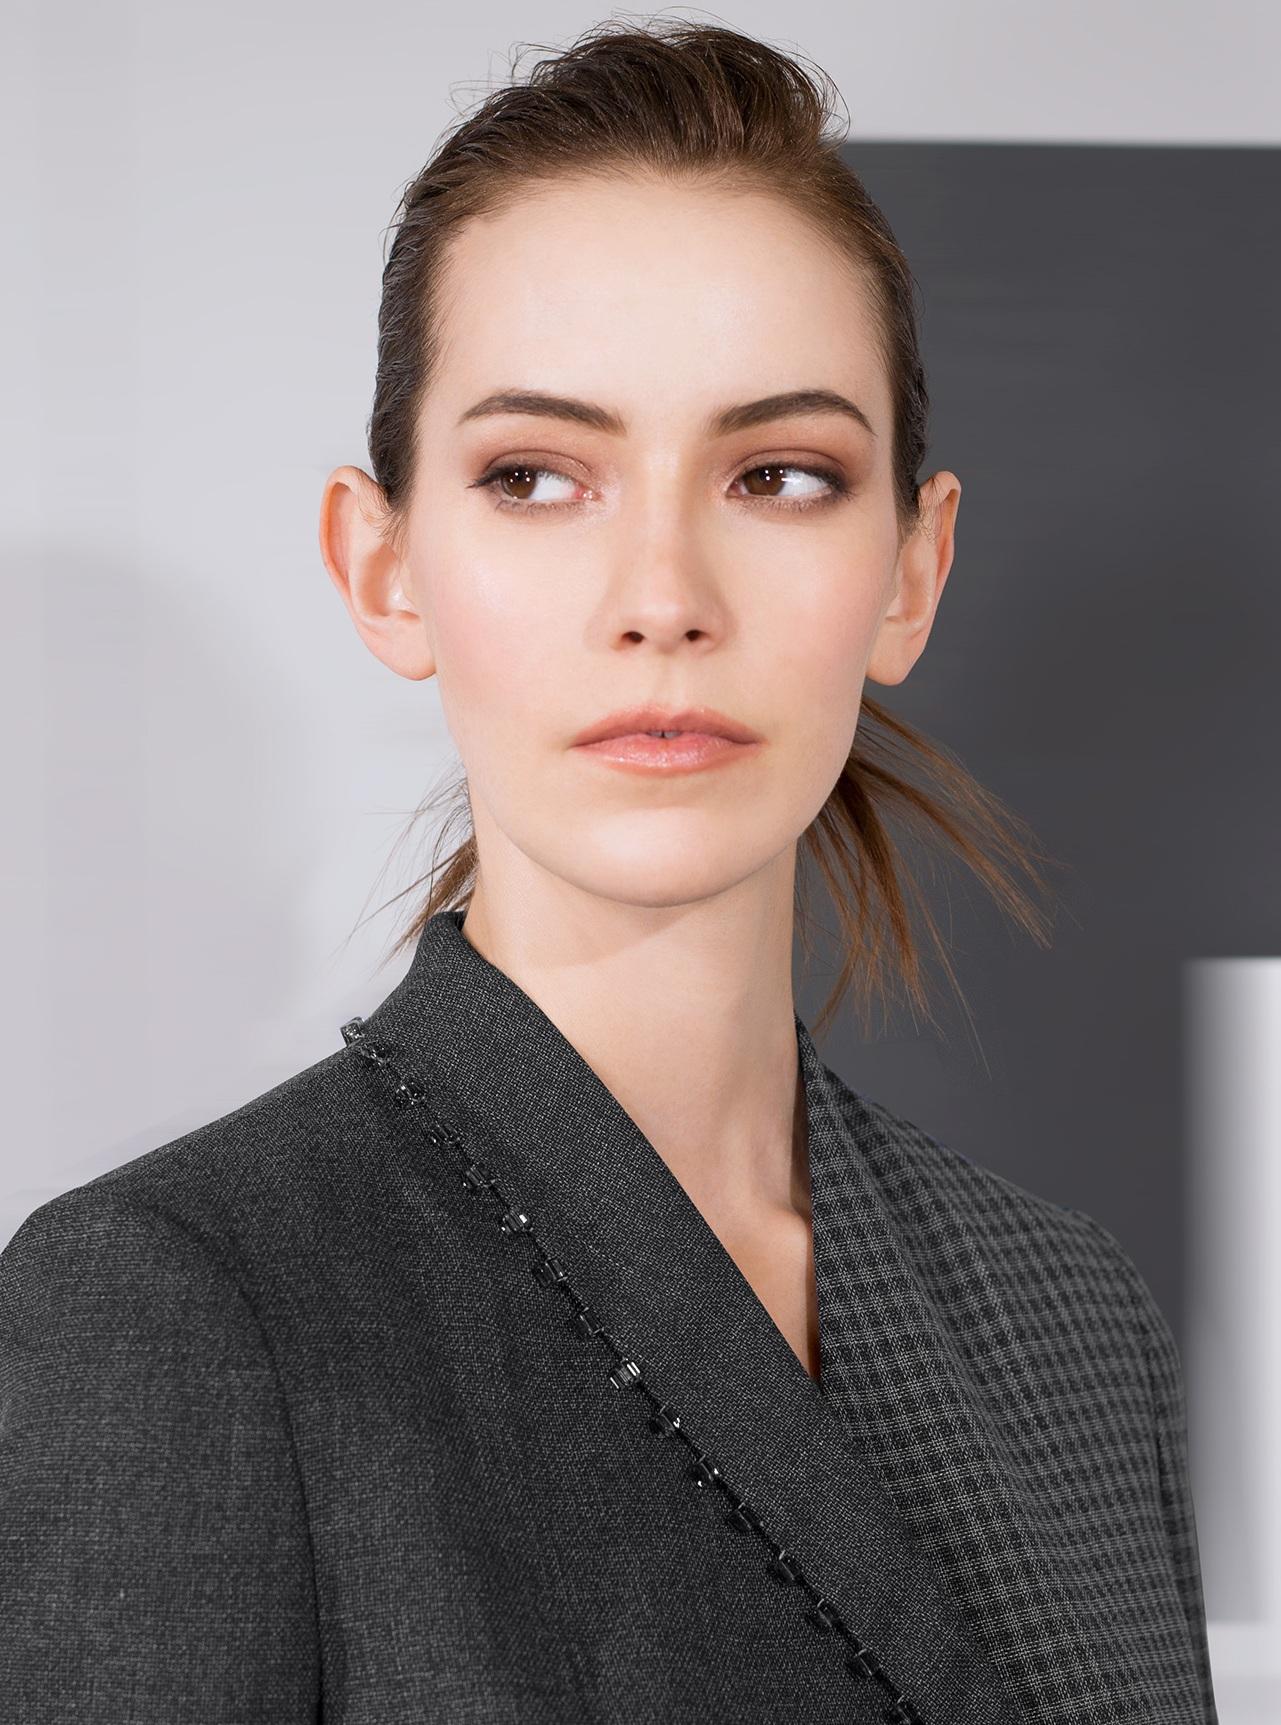 Jacket+Micro+plaid+wool+black+oyster+with+black+beaded+lapel+5B-9461.jpg